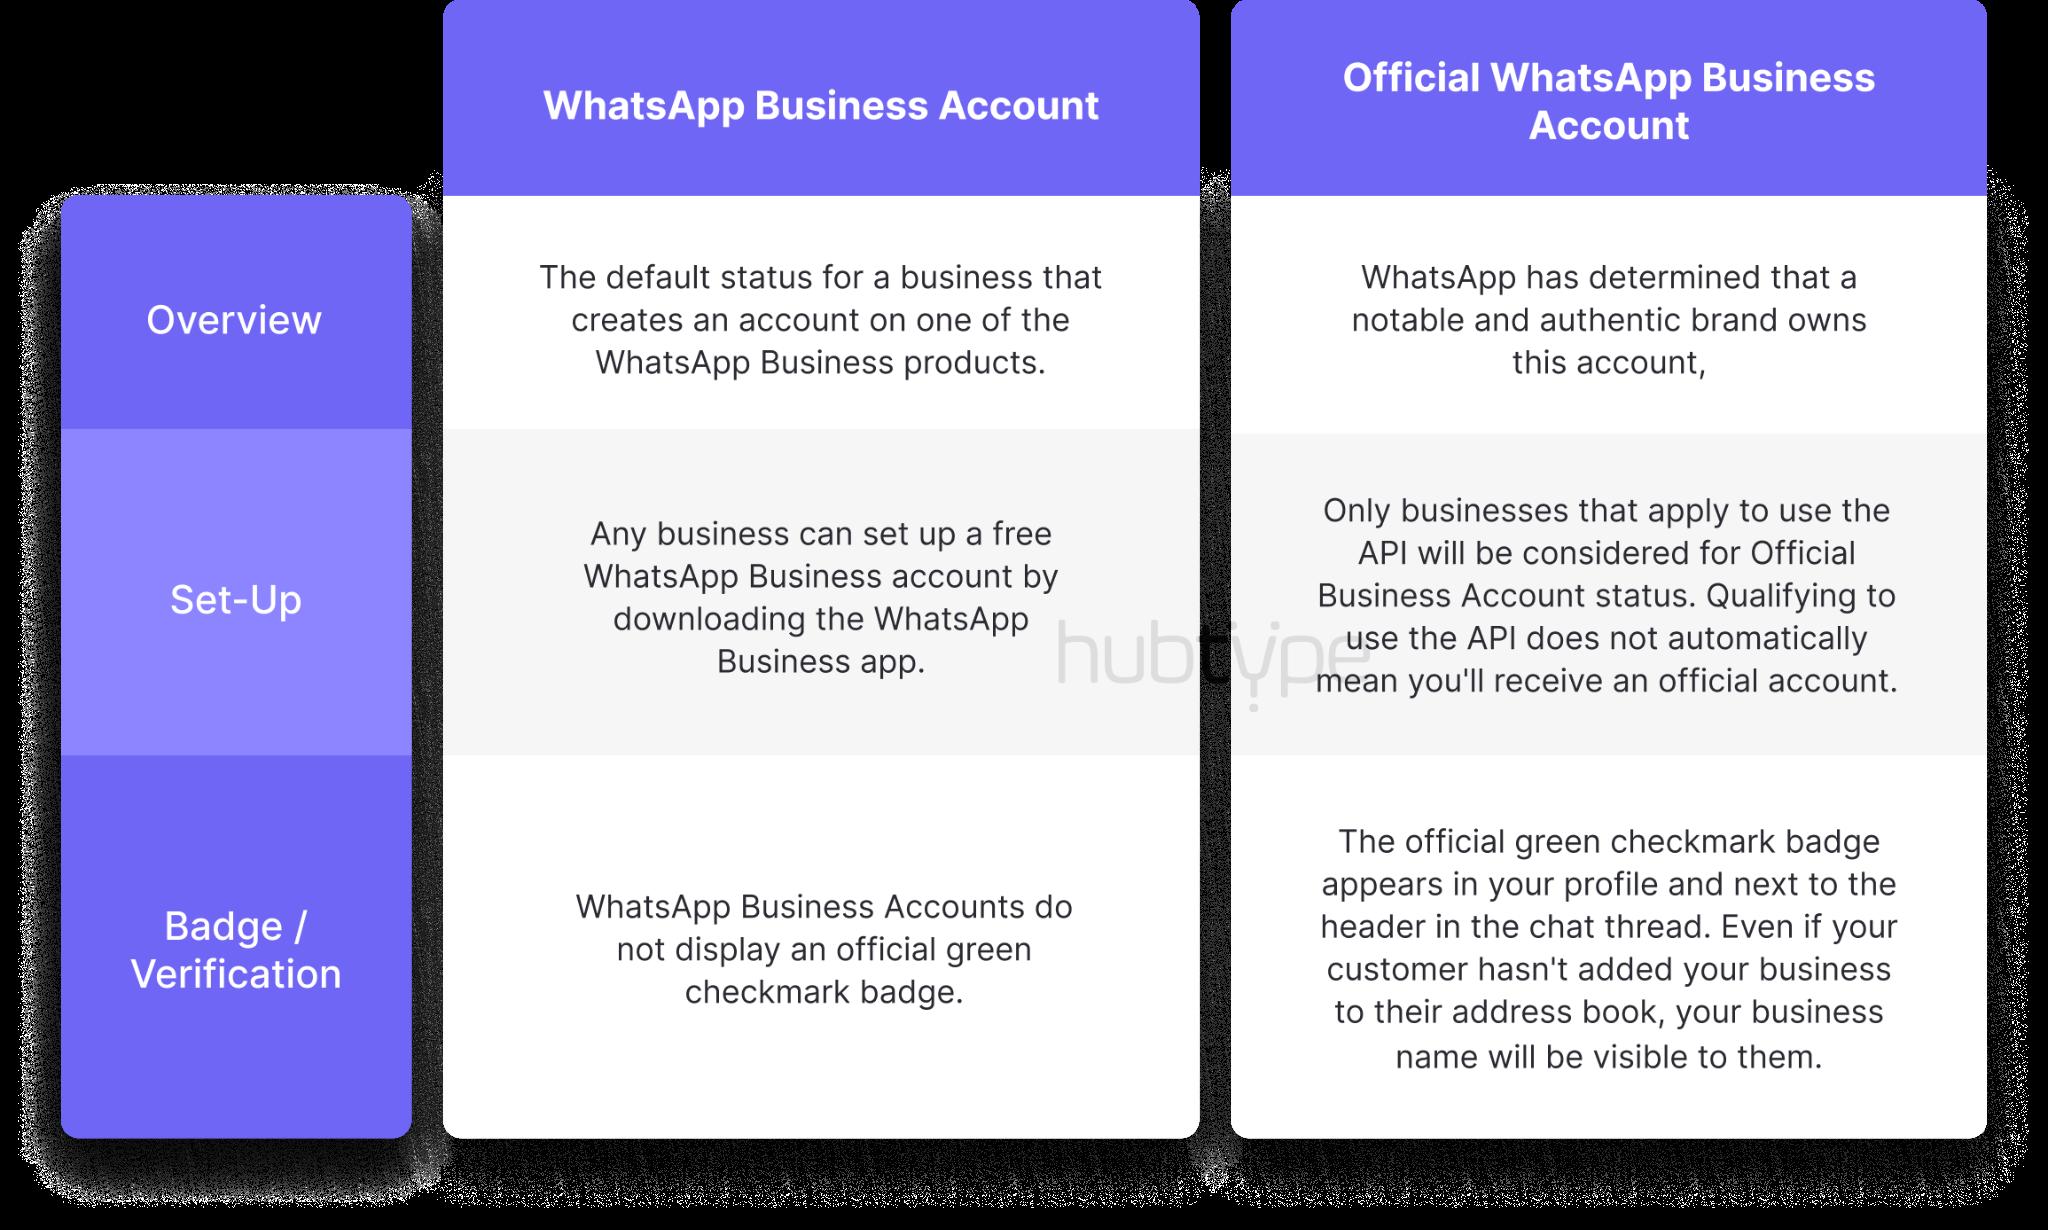 whatsapp business acount vs. official whatsapp business account